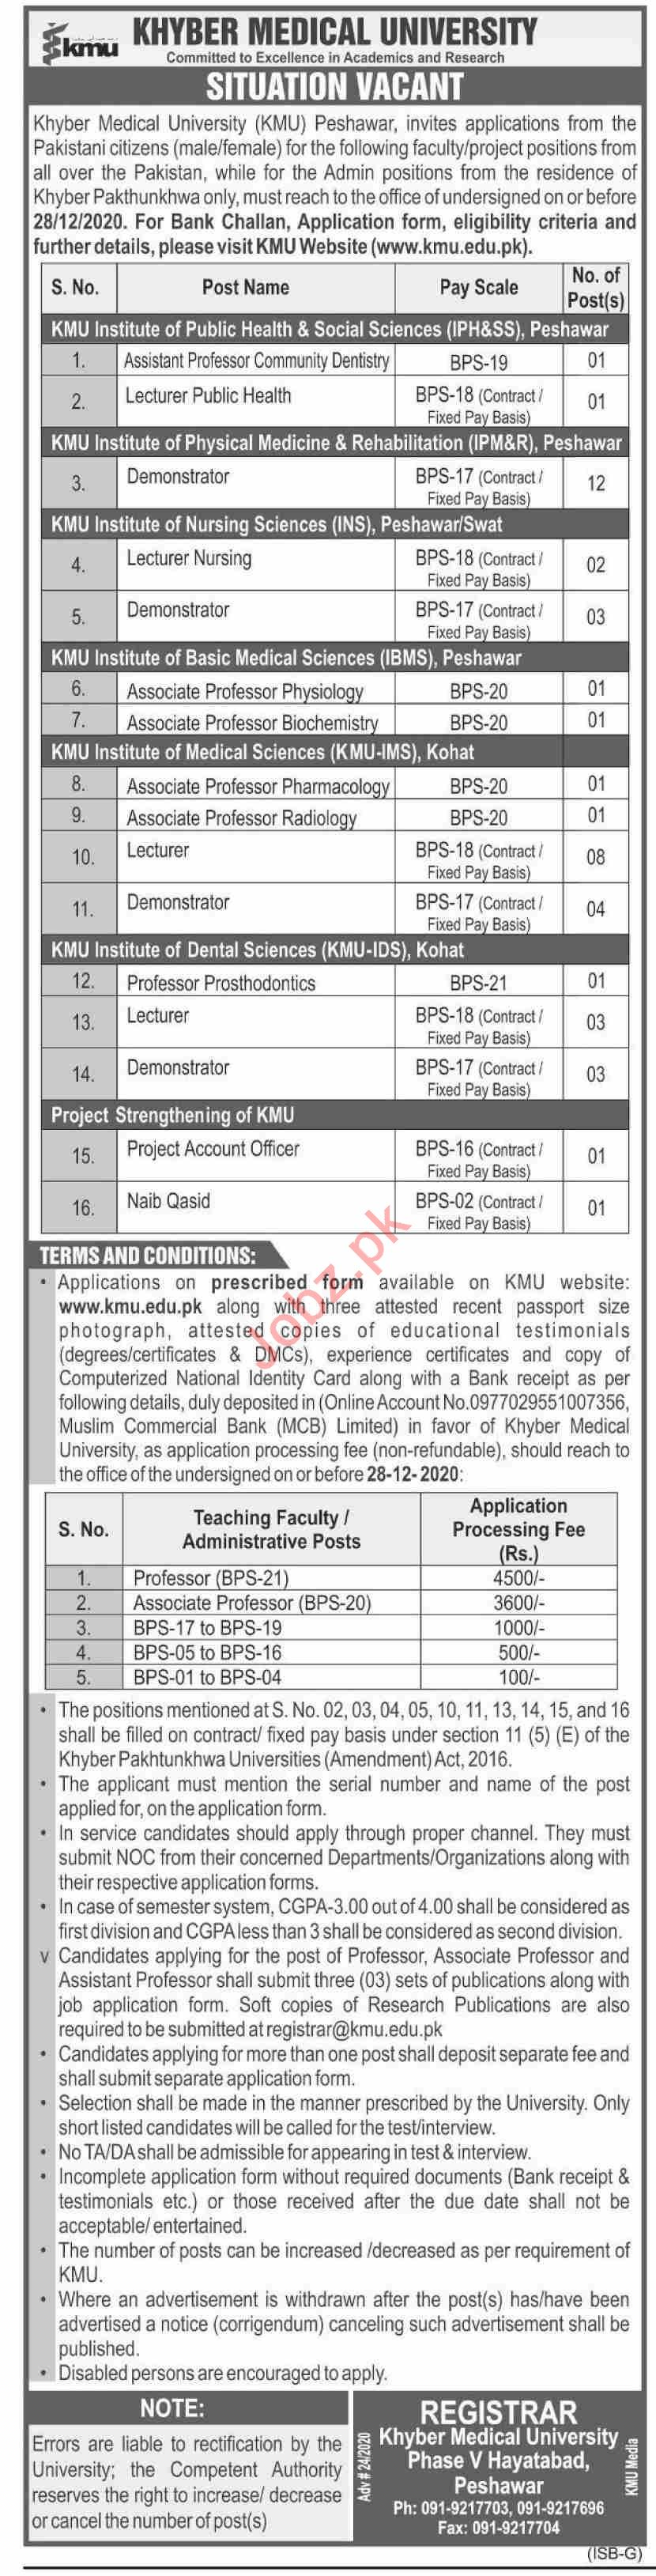 Khyber Medical College KMC MTI Jobs 2020 for Professor